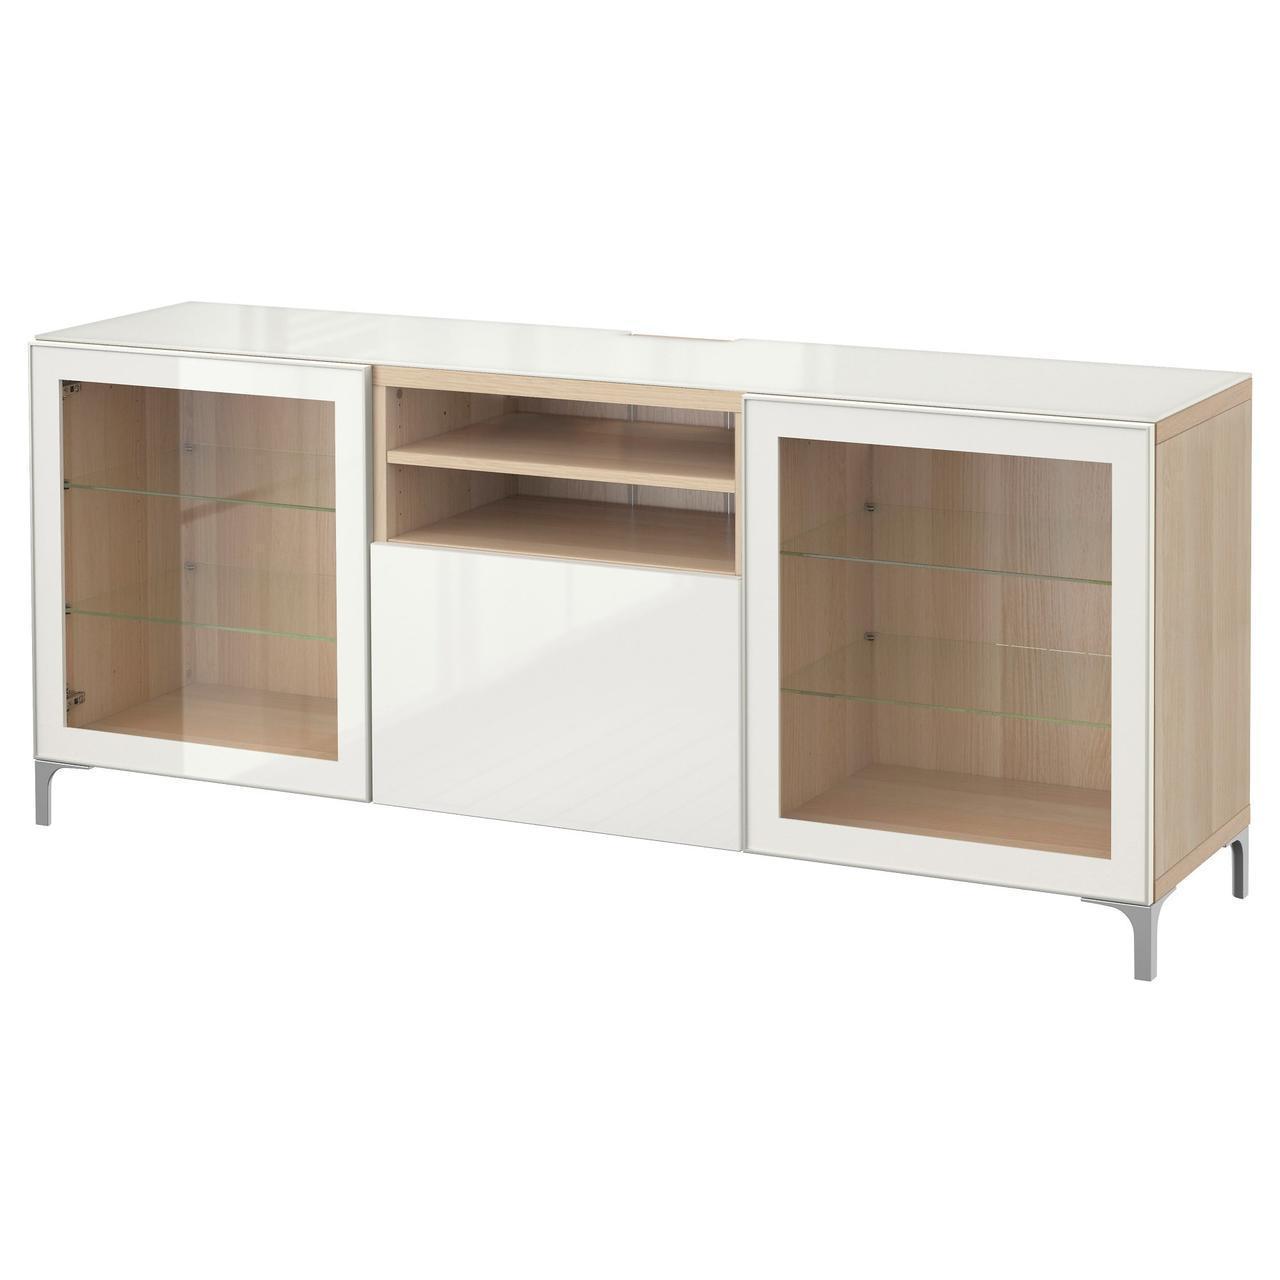 IKEA BESTA Тумба под телевизор, белый стаинедед дуб, Сельсвикен глянцевый/белый (991.968.47)